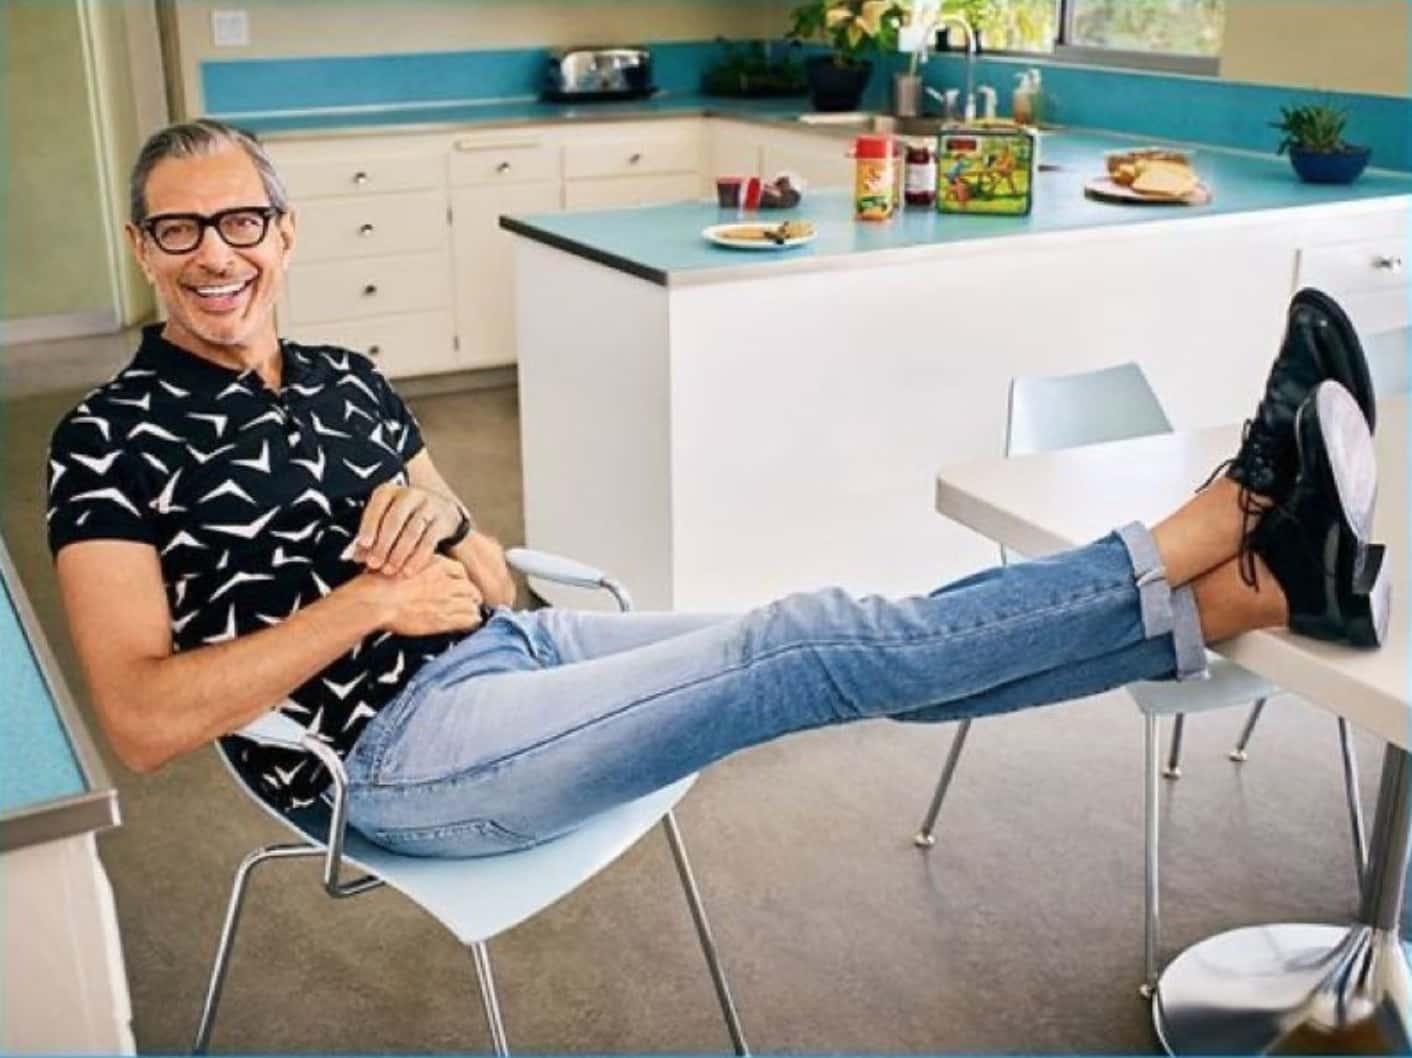 Jeff Goldblum (1.95cm)